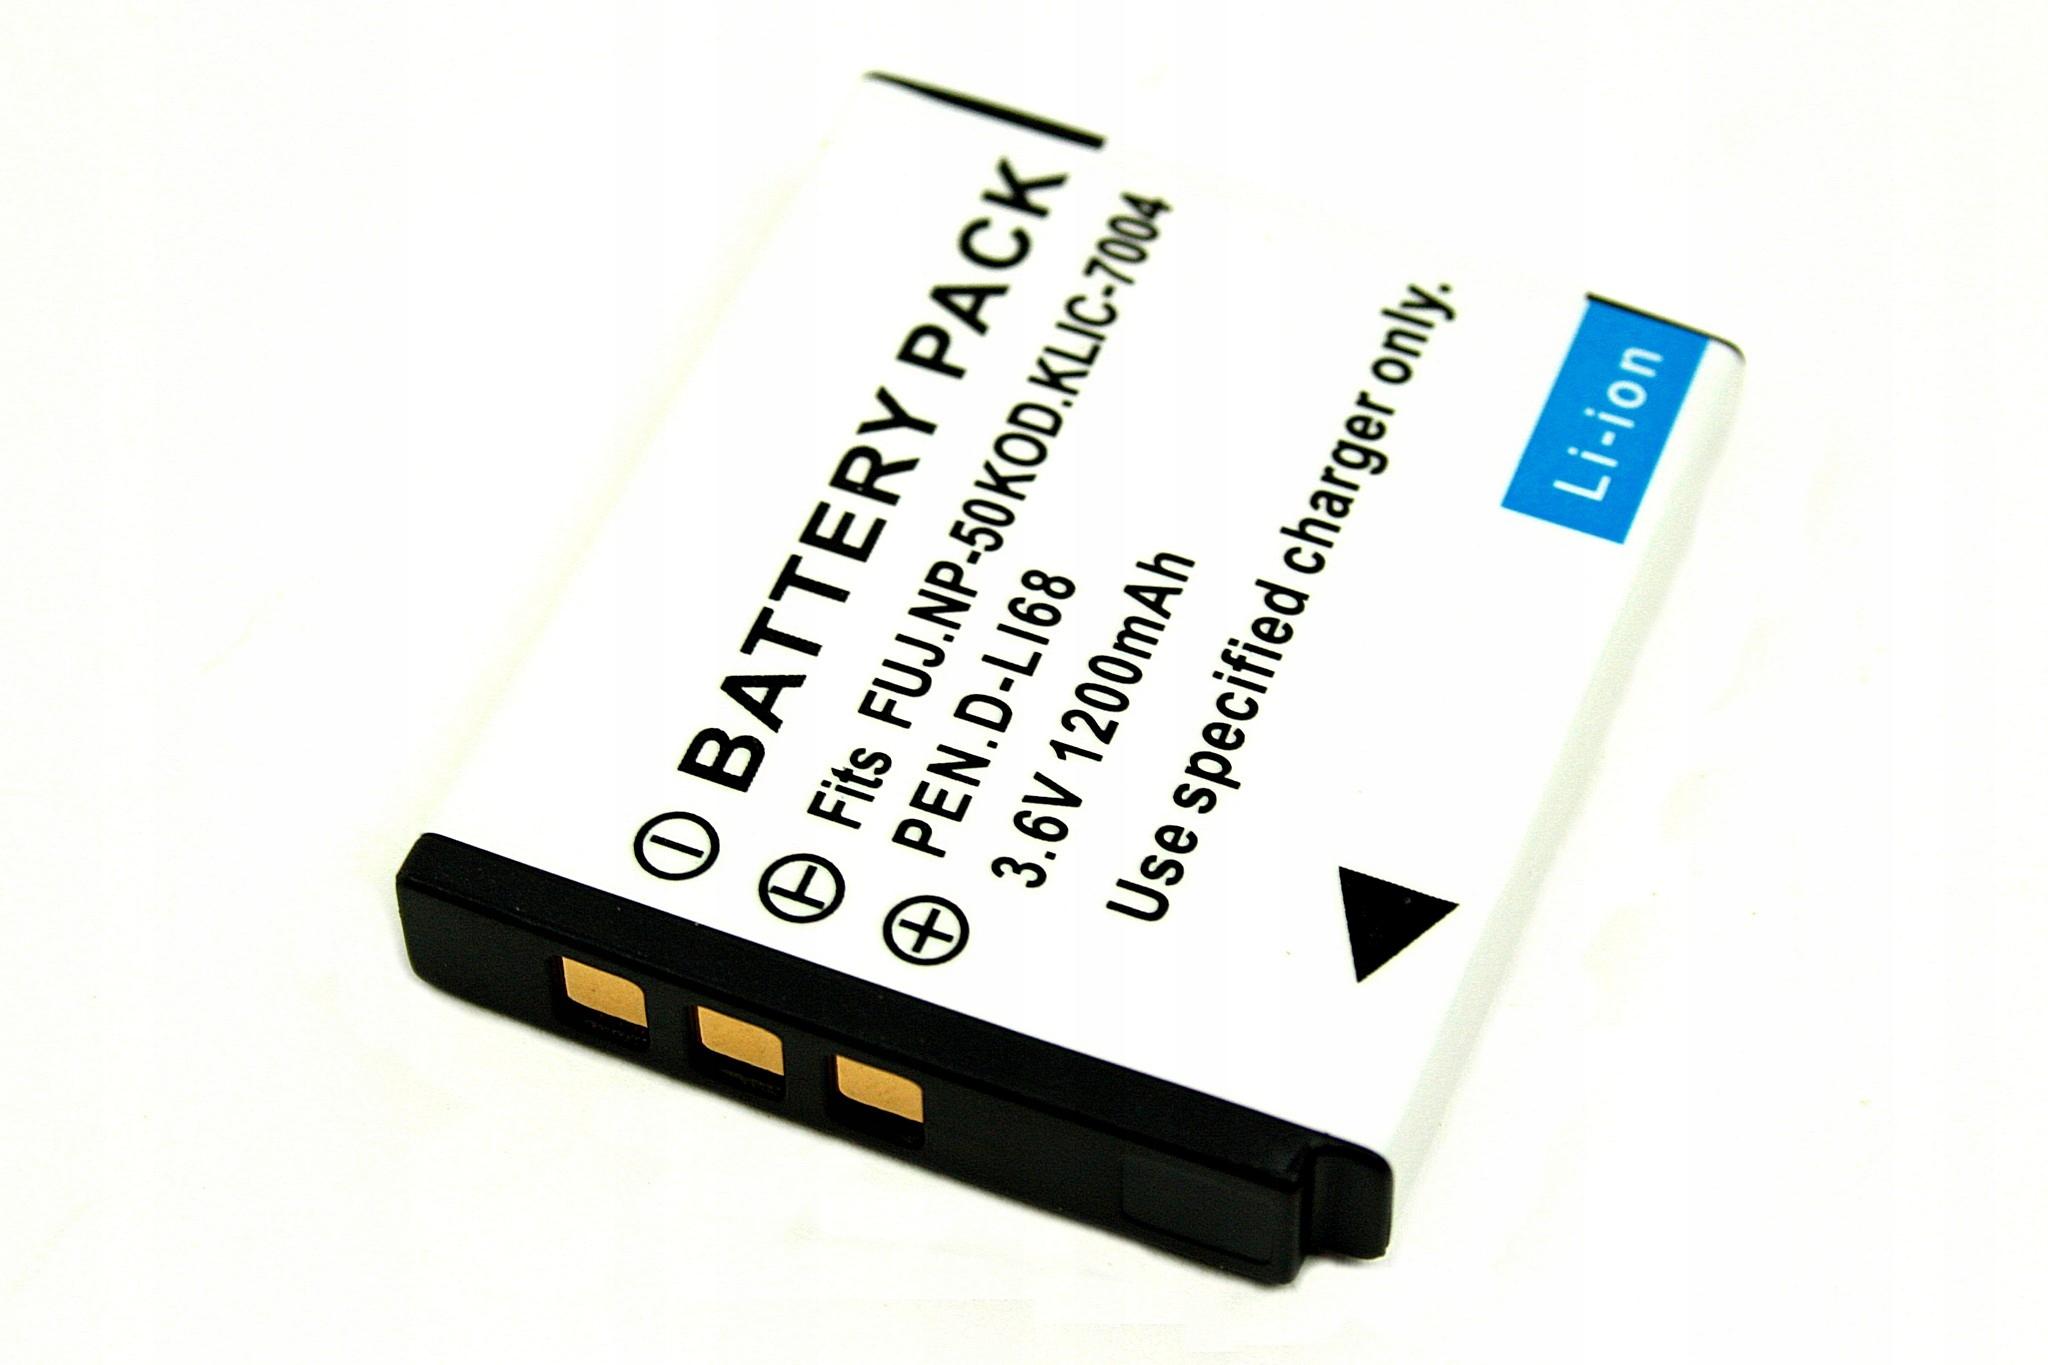 BATERIA AKUMULATOR FUJI NP-50A FINEPIX XP100 XP150 - Baterie do aparatów cyfrowych